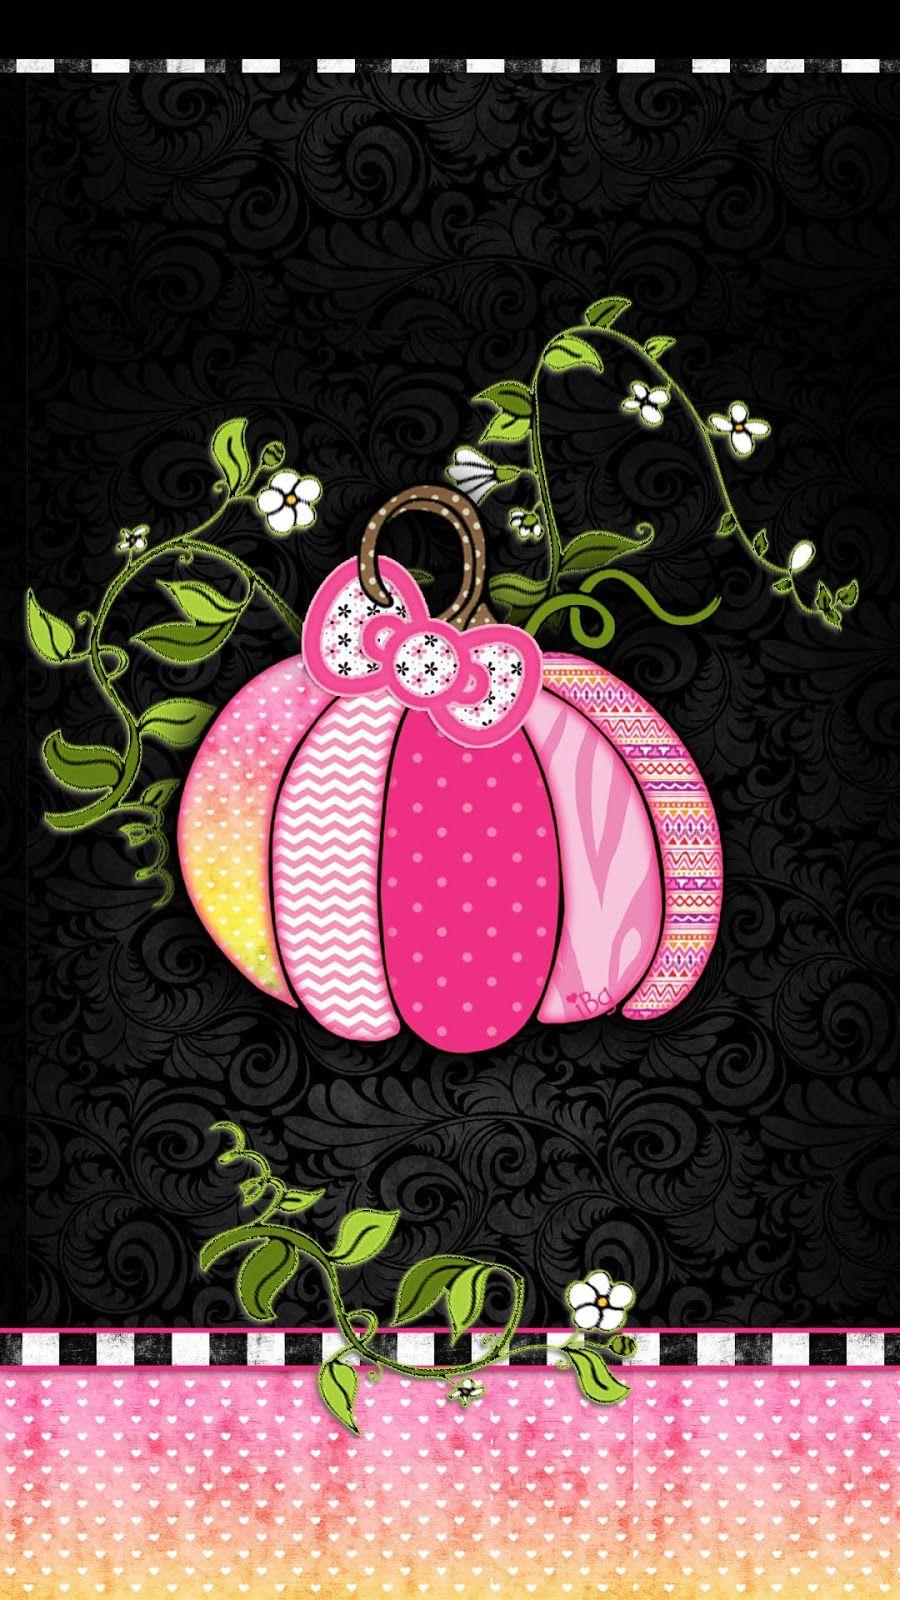 iBabyGirl Halloween tjn Apple watch wallpaper